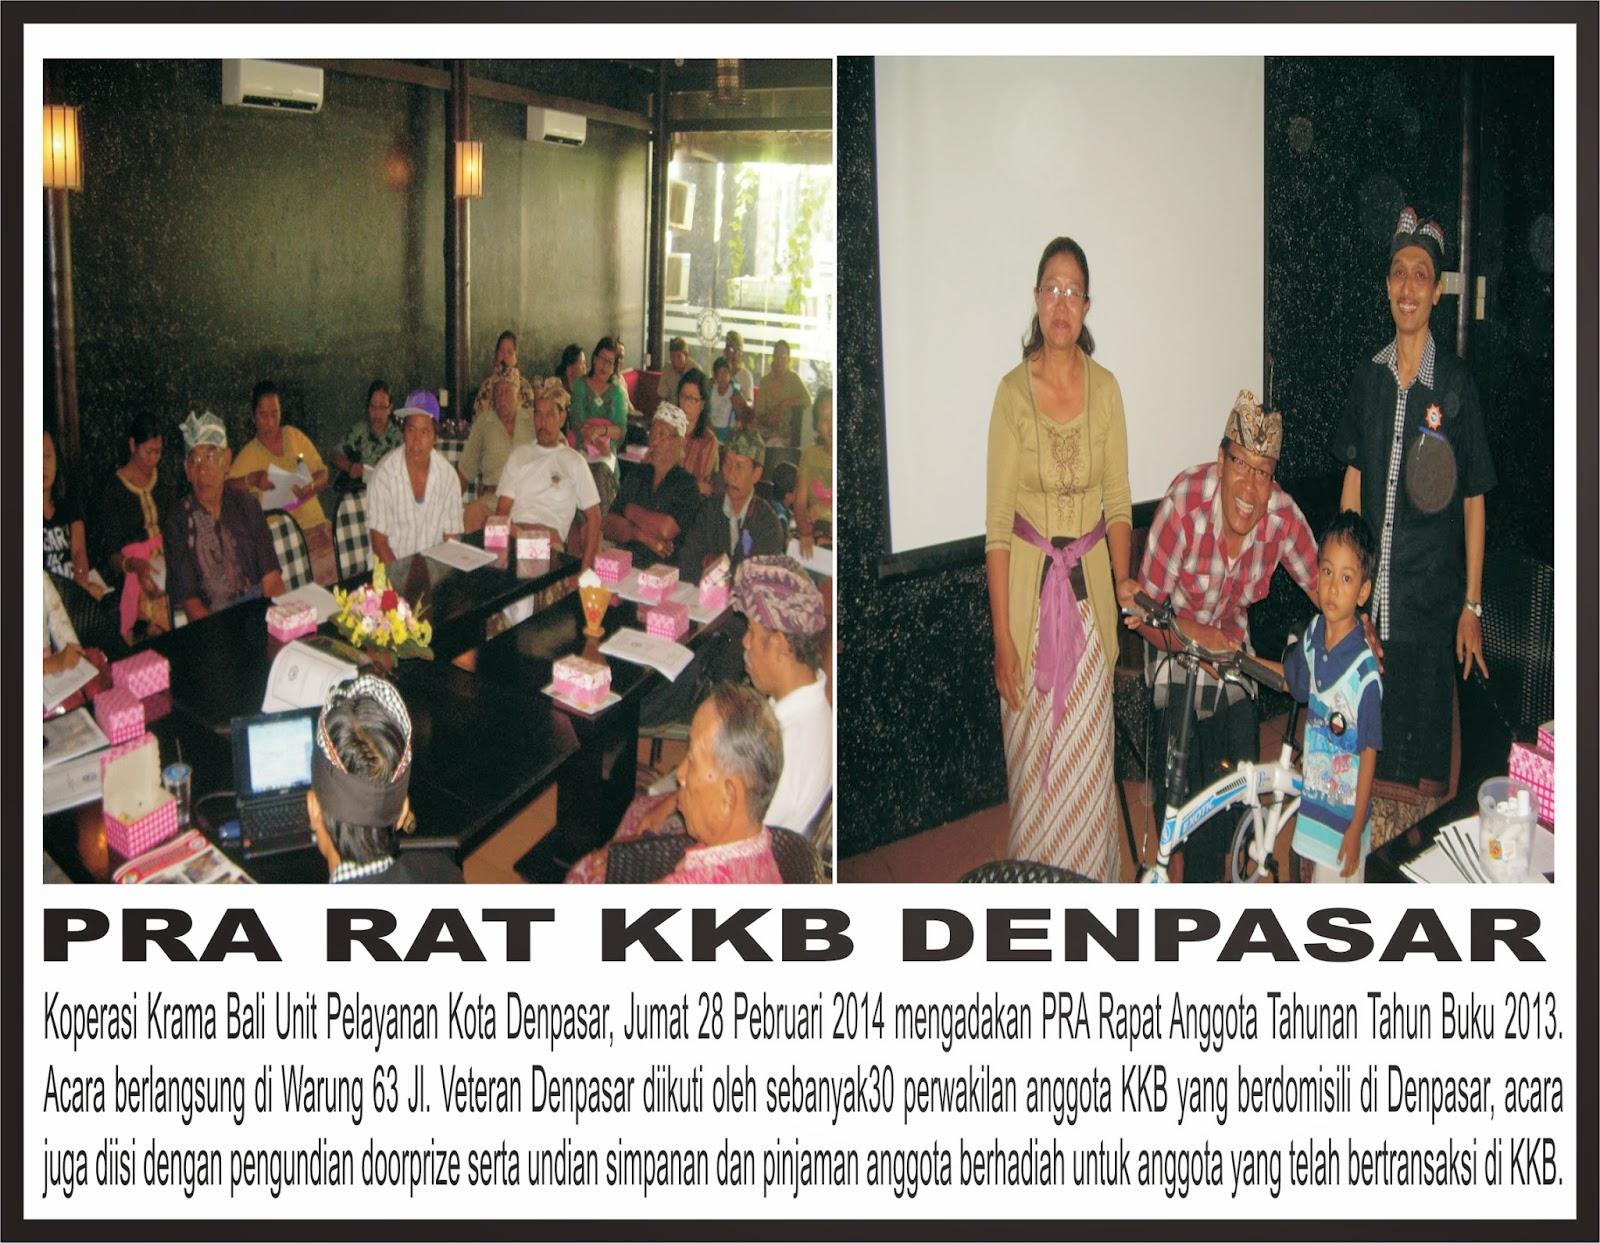 Pra RAT Denpasar